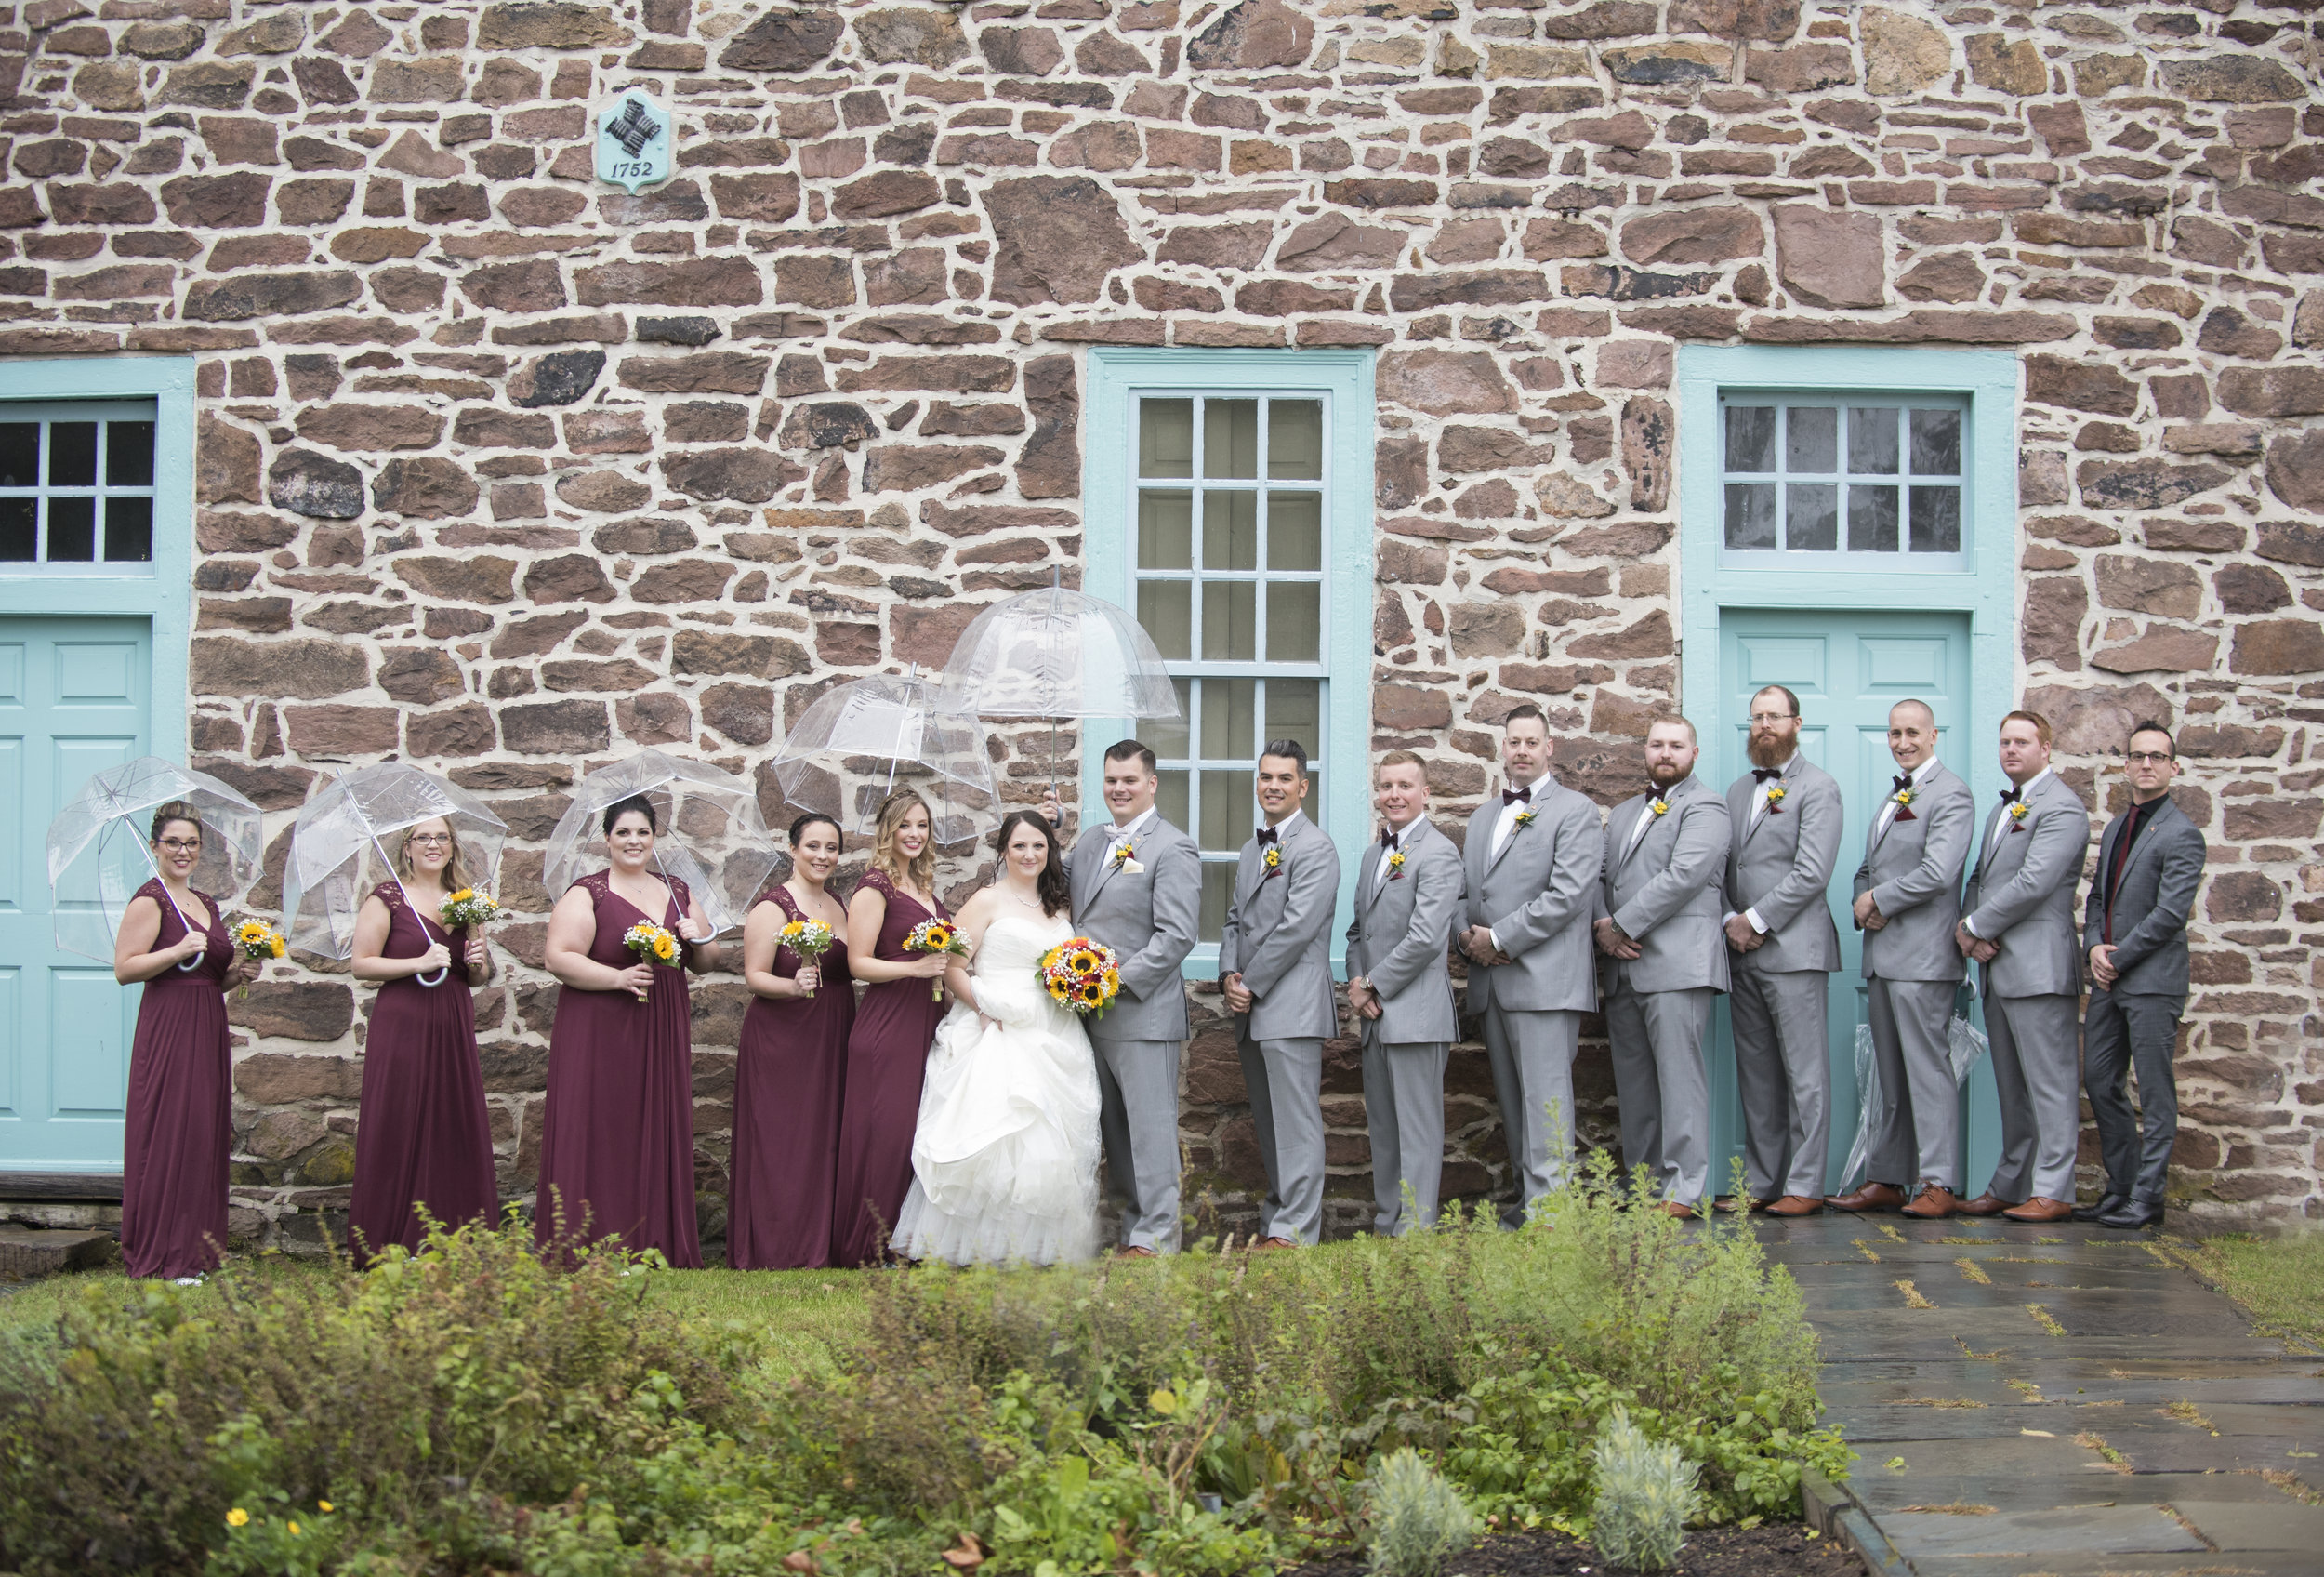 Graeme Park Wedding